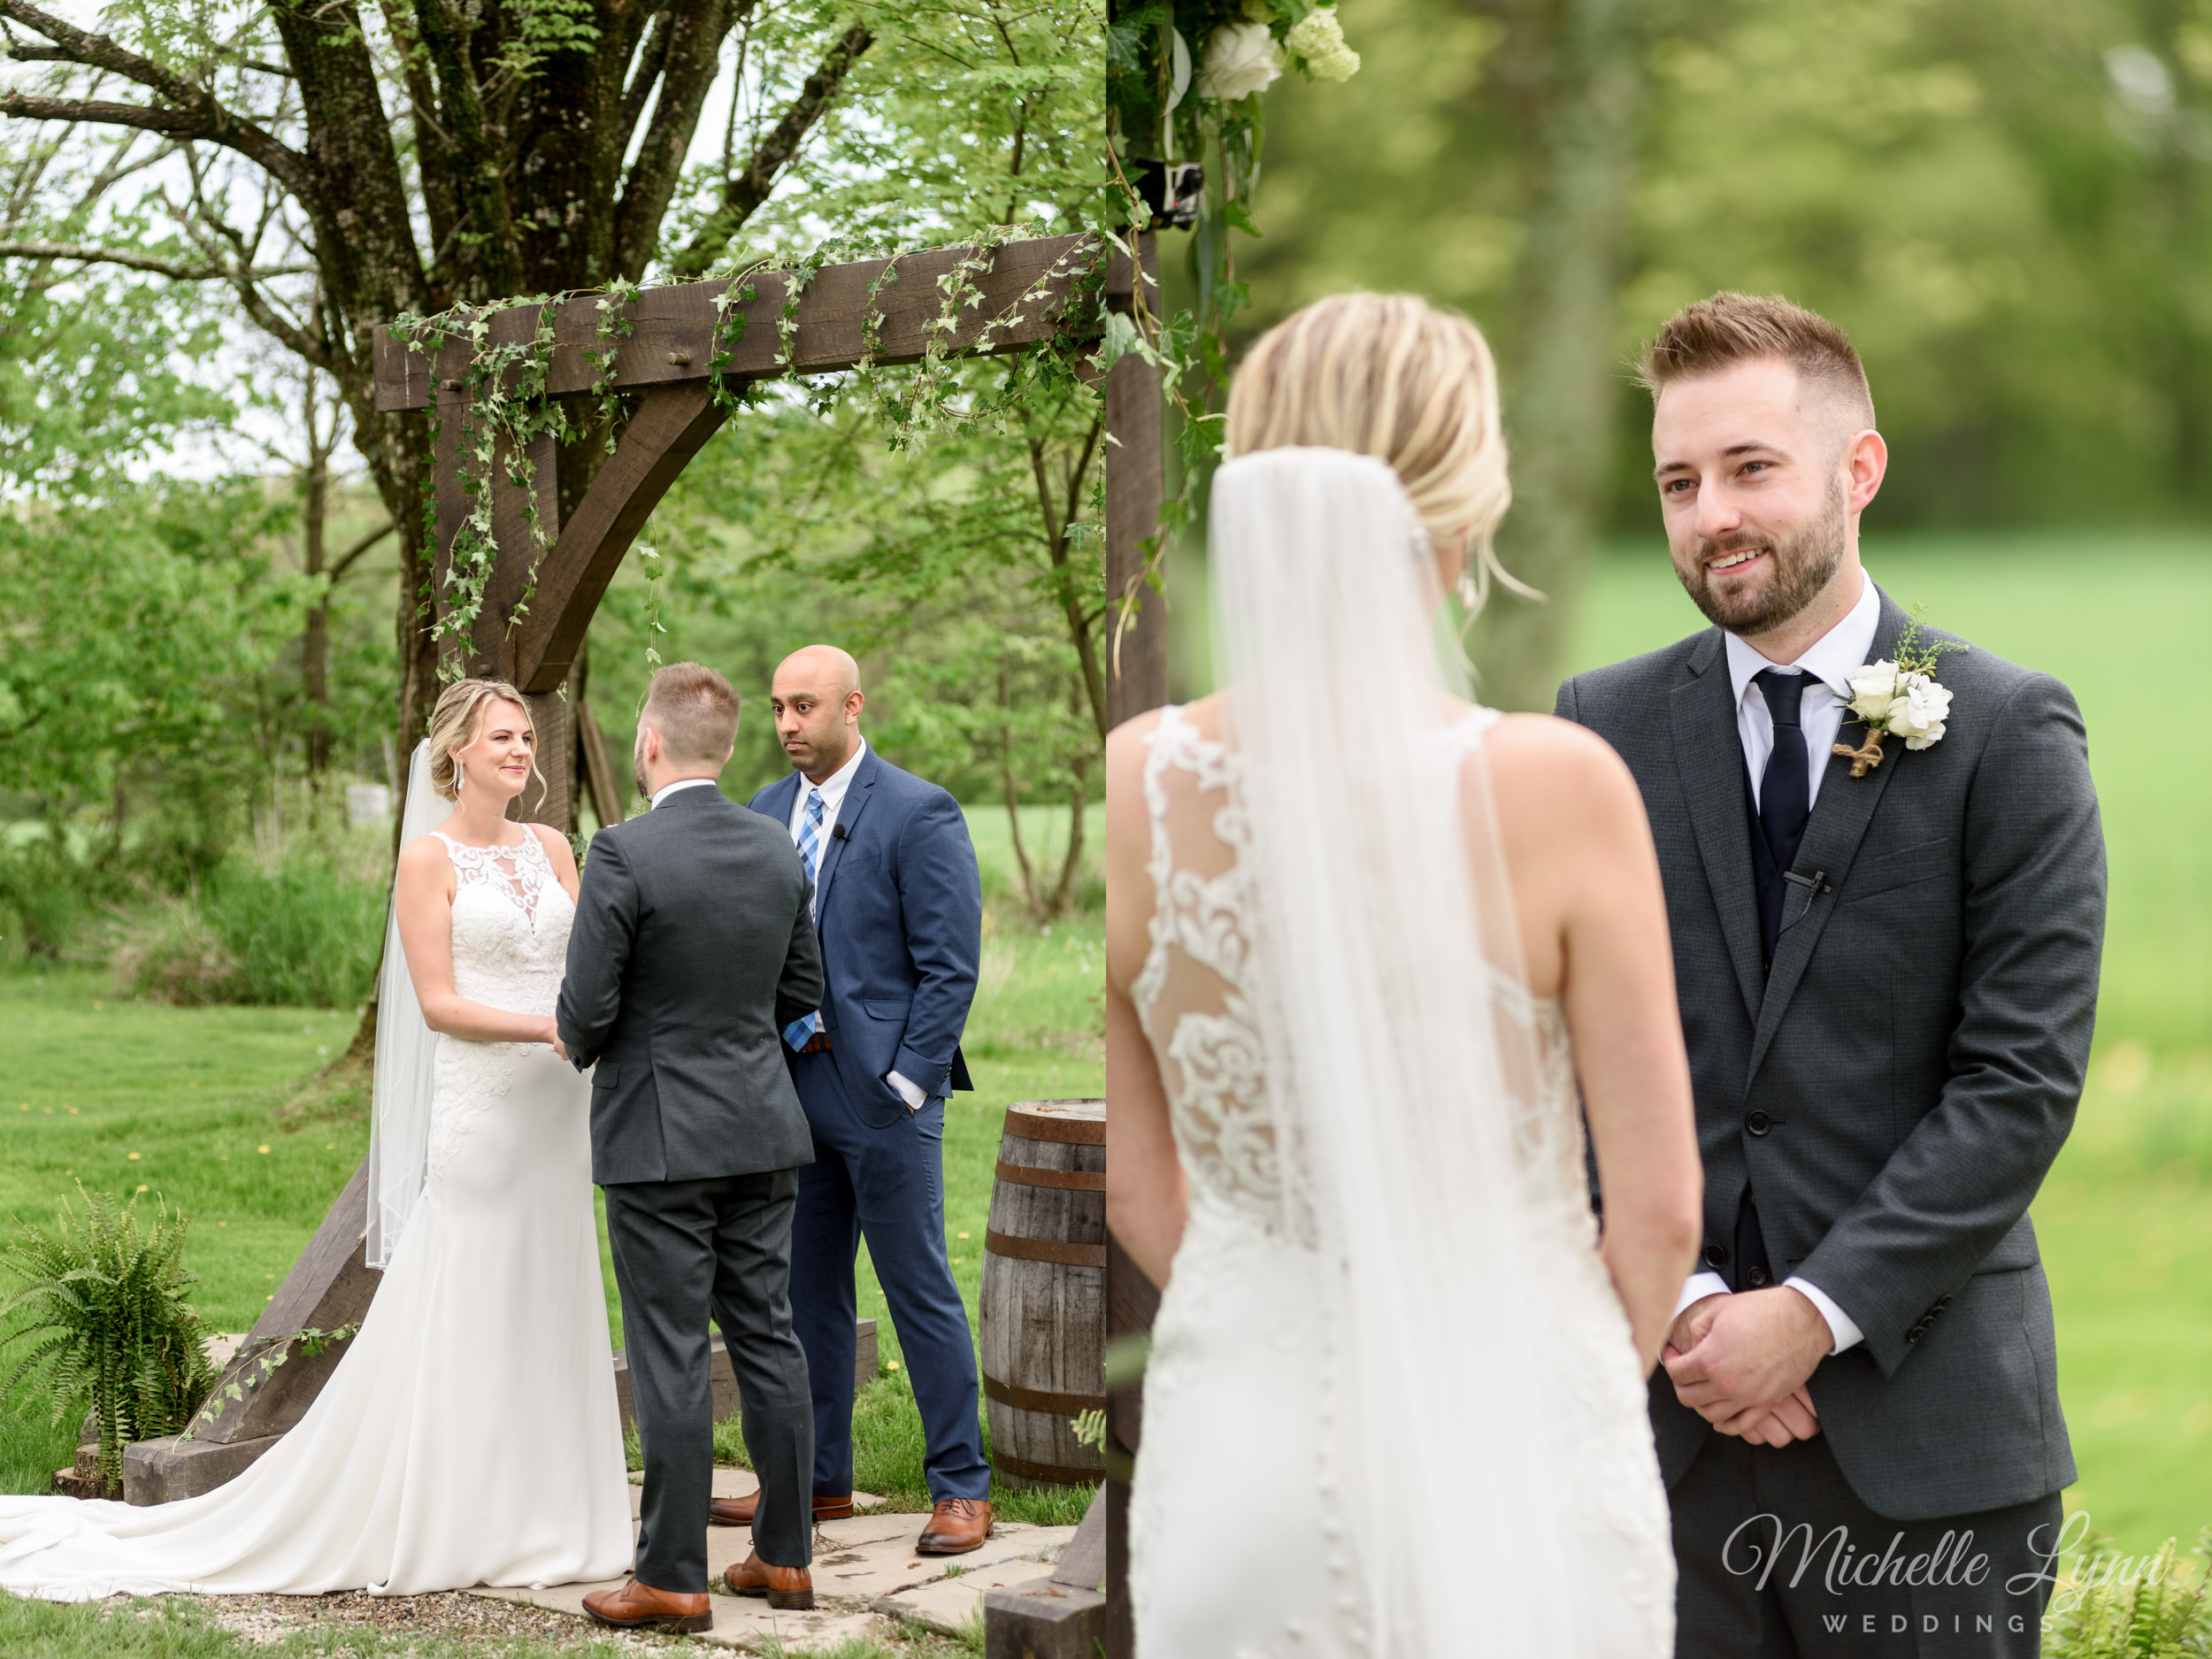 mlw-the-farm-bakery-and-events-wedding-photos-35.jpg